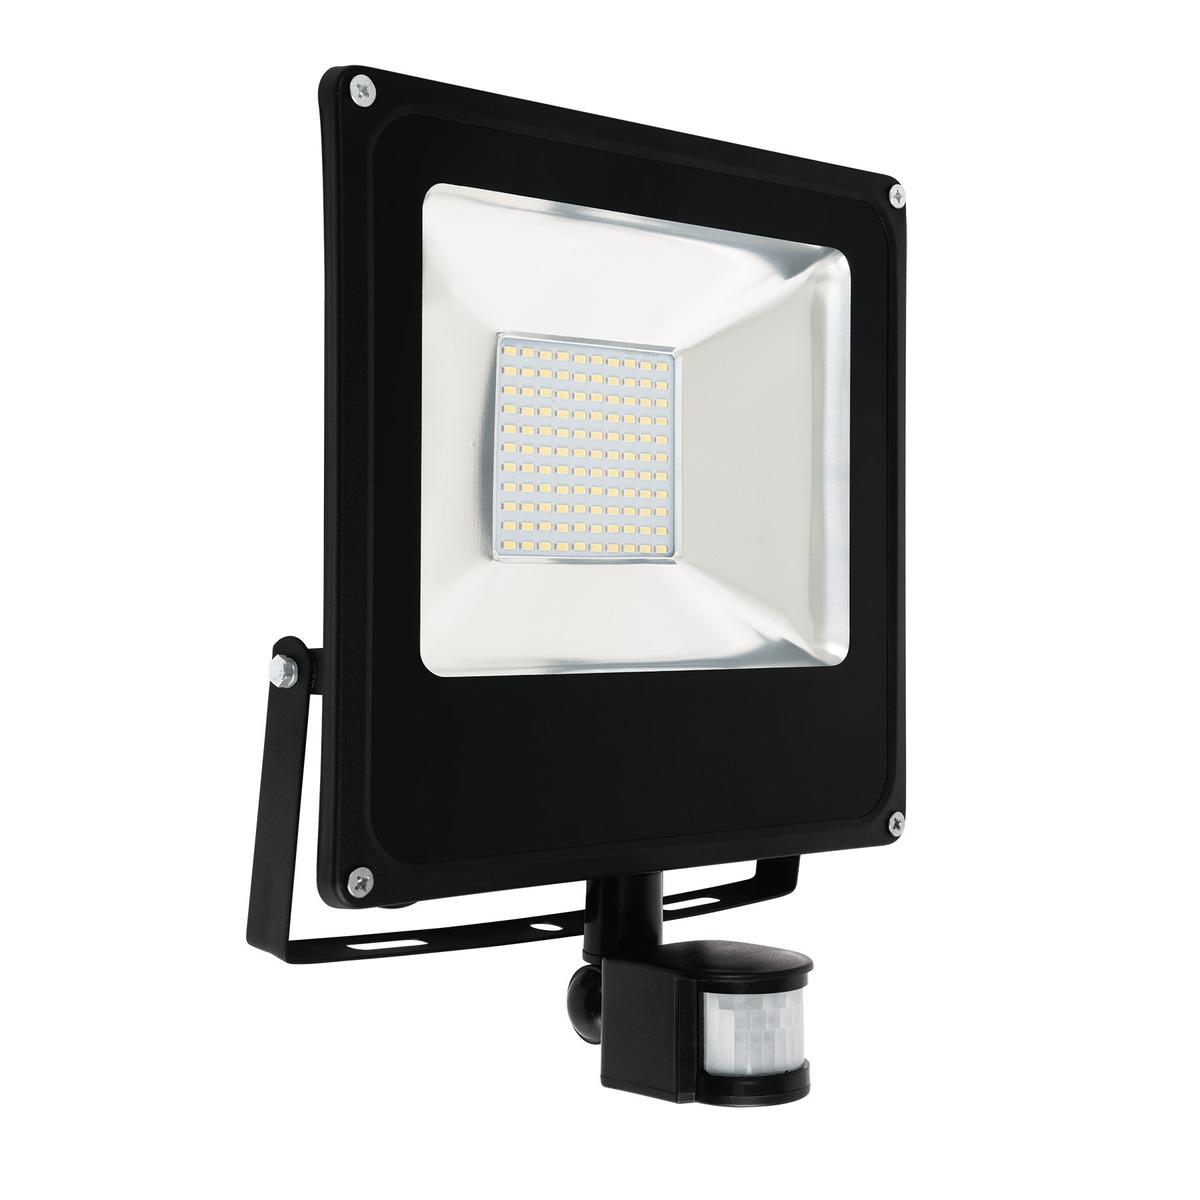 Luminario De Led, Con Sensor De Movimiento, 30 W 48230